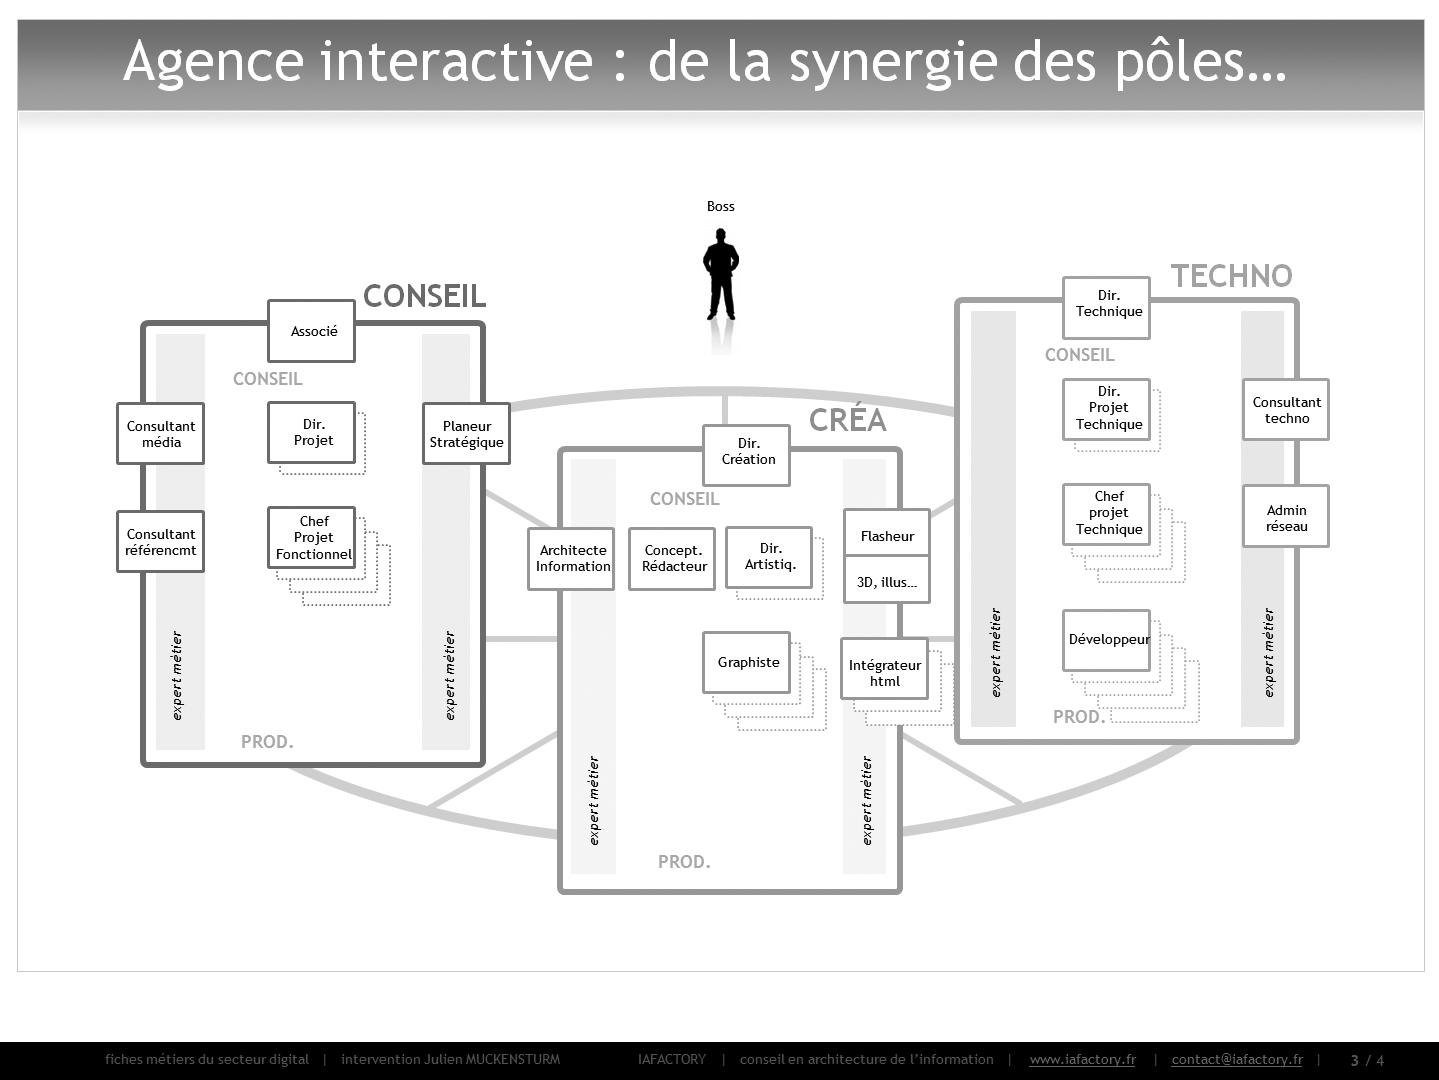 organisation interne de l'agence interactive